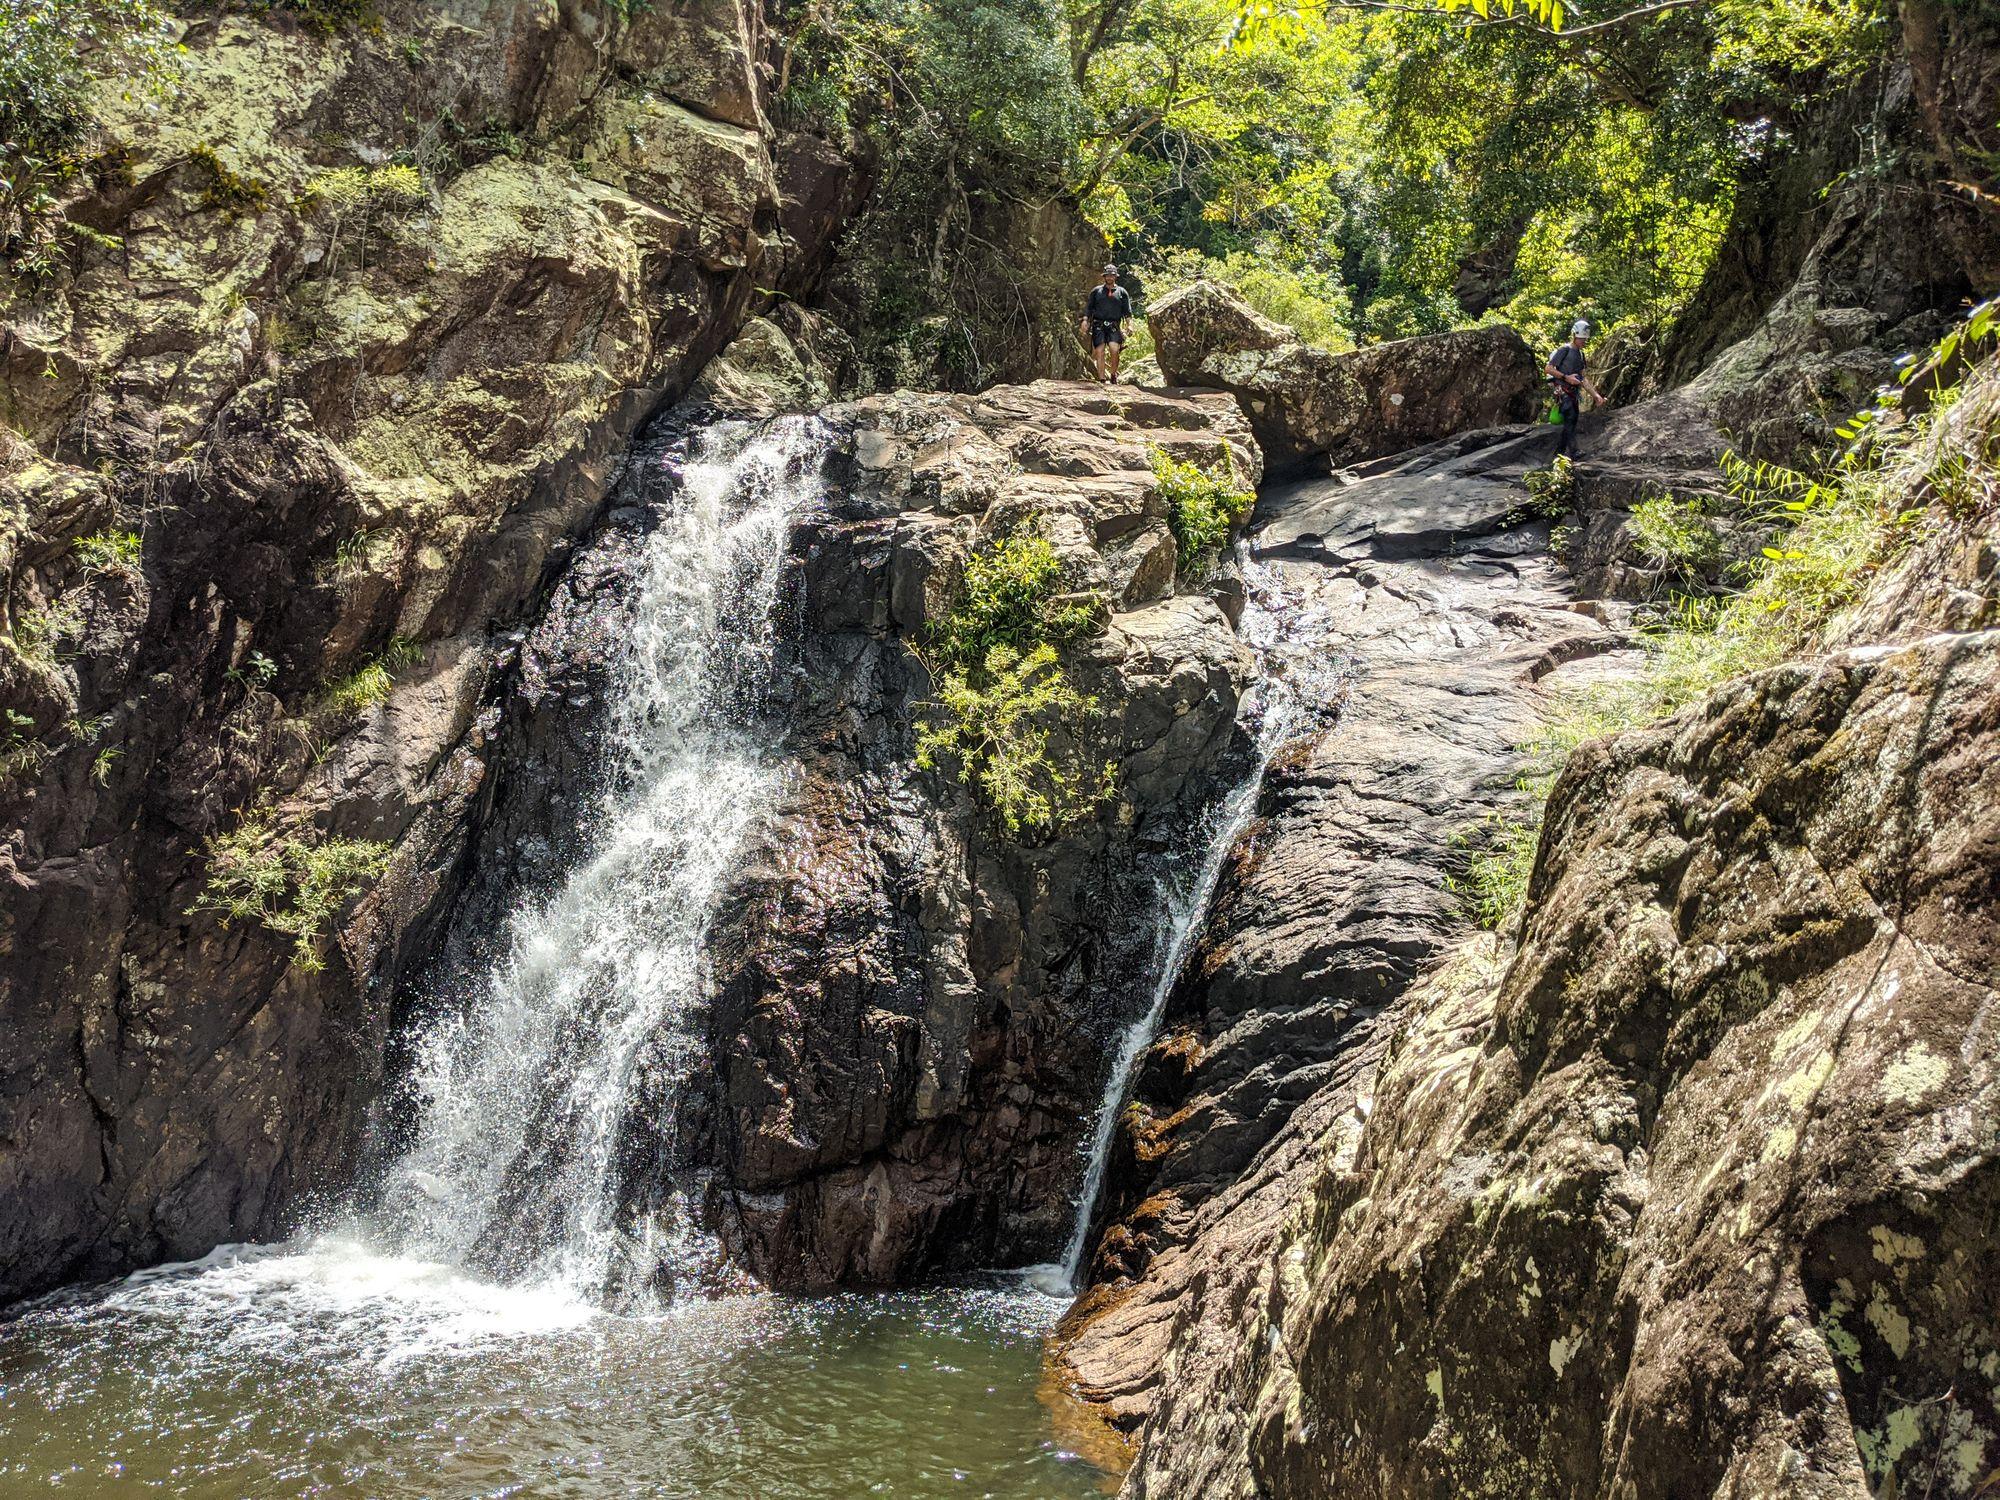 Tinkle Creek scramble